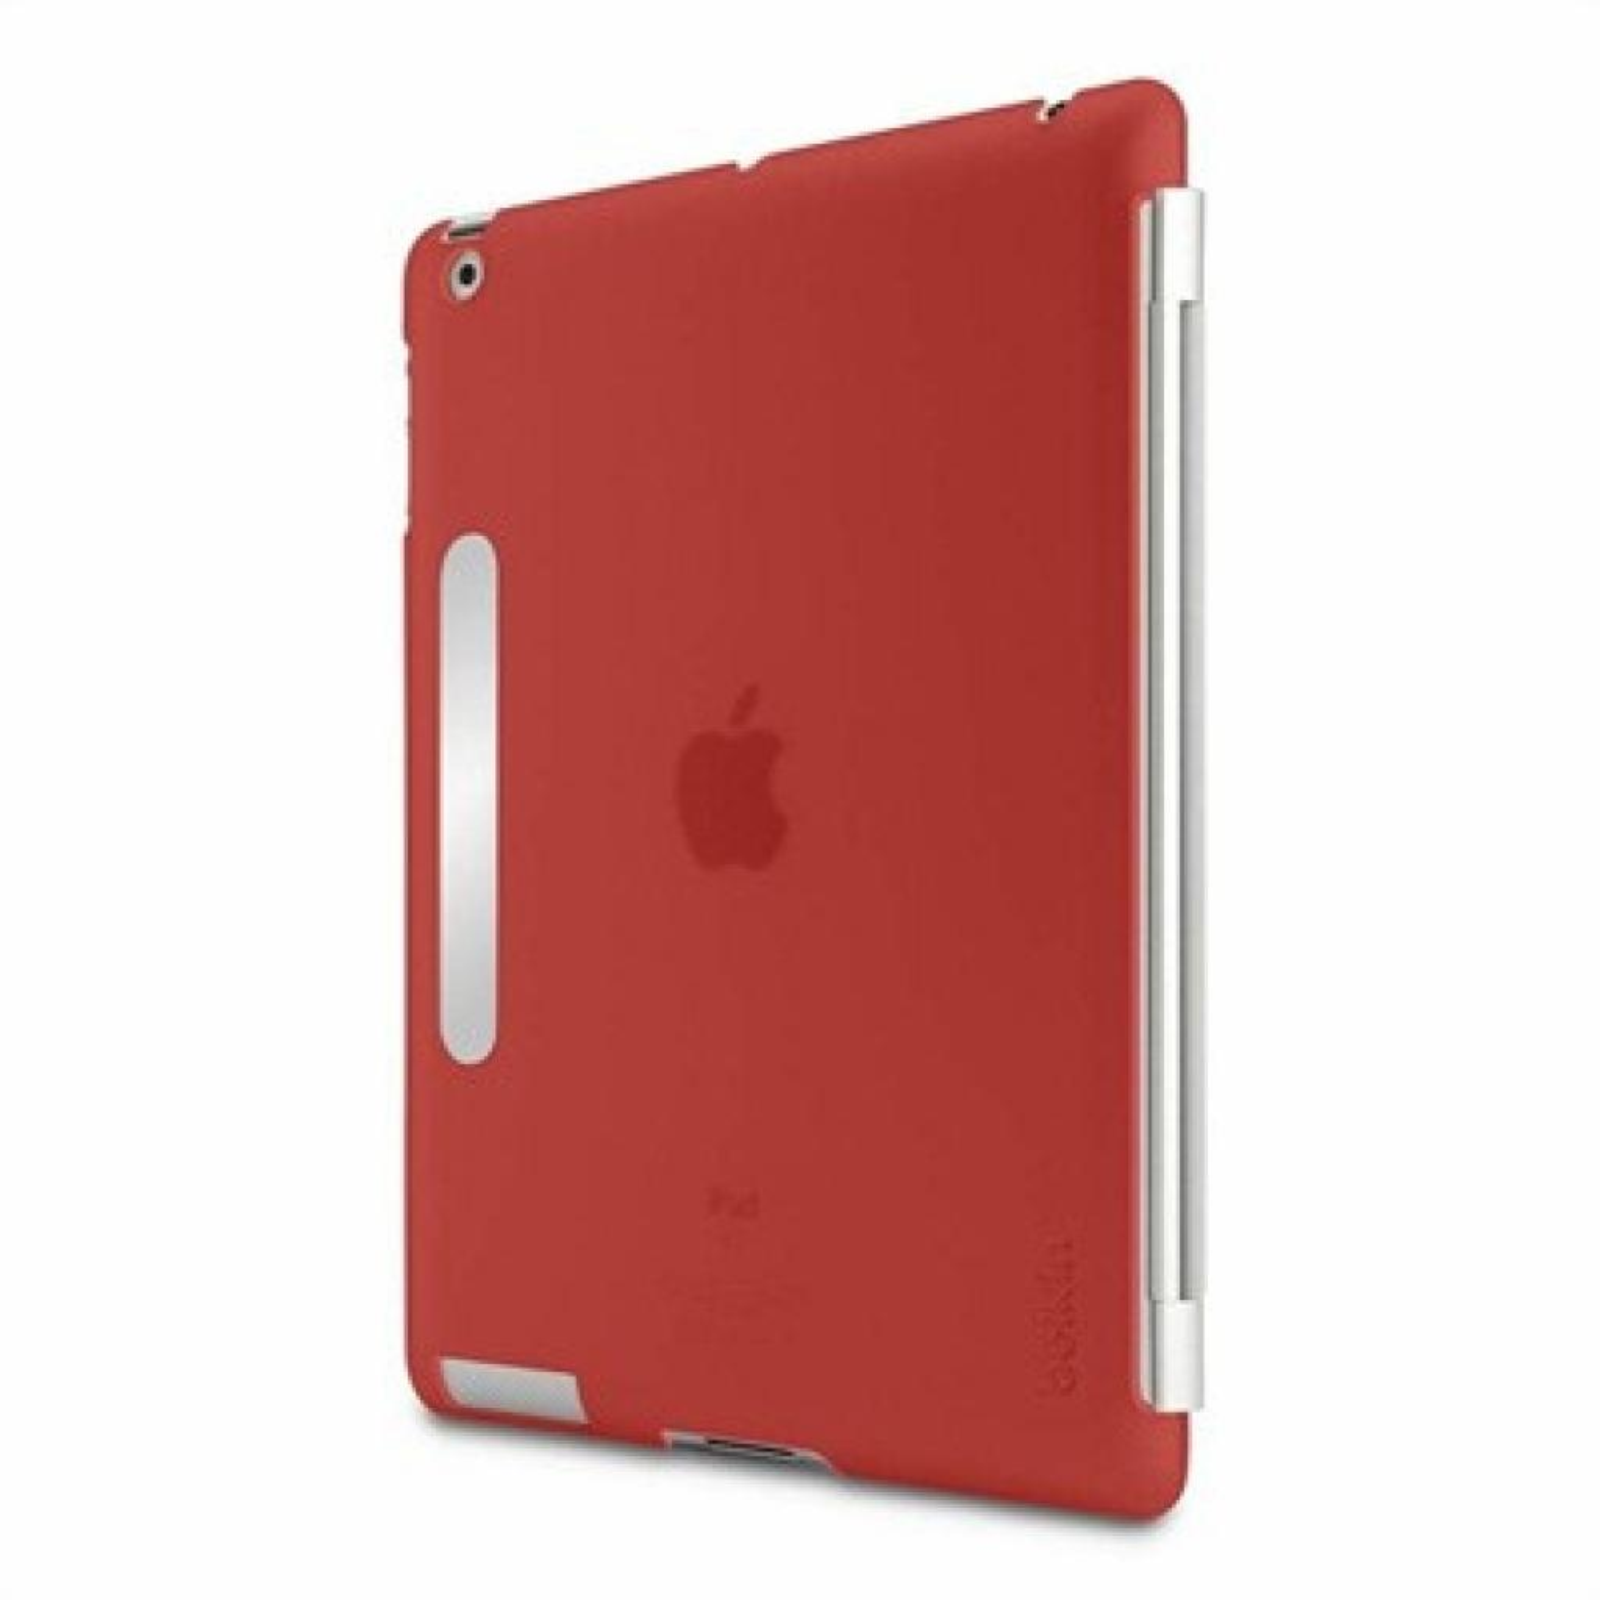 Чехол для планшета Belkin iPad2, iPad3, iPad4 Snap Shield Secure (Red) (F8N745cwC02)